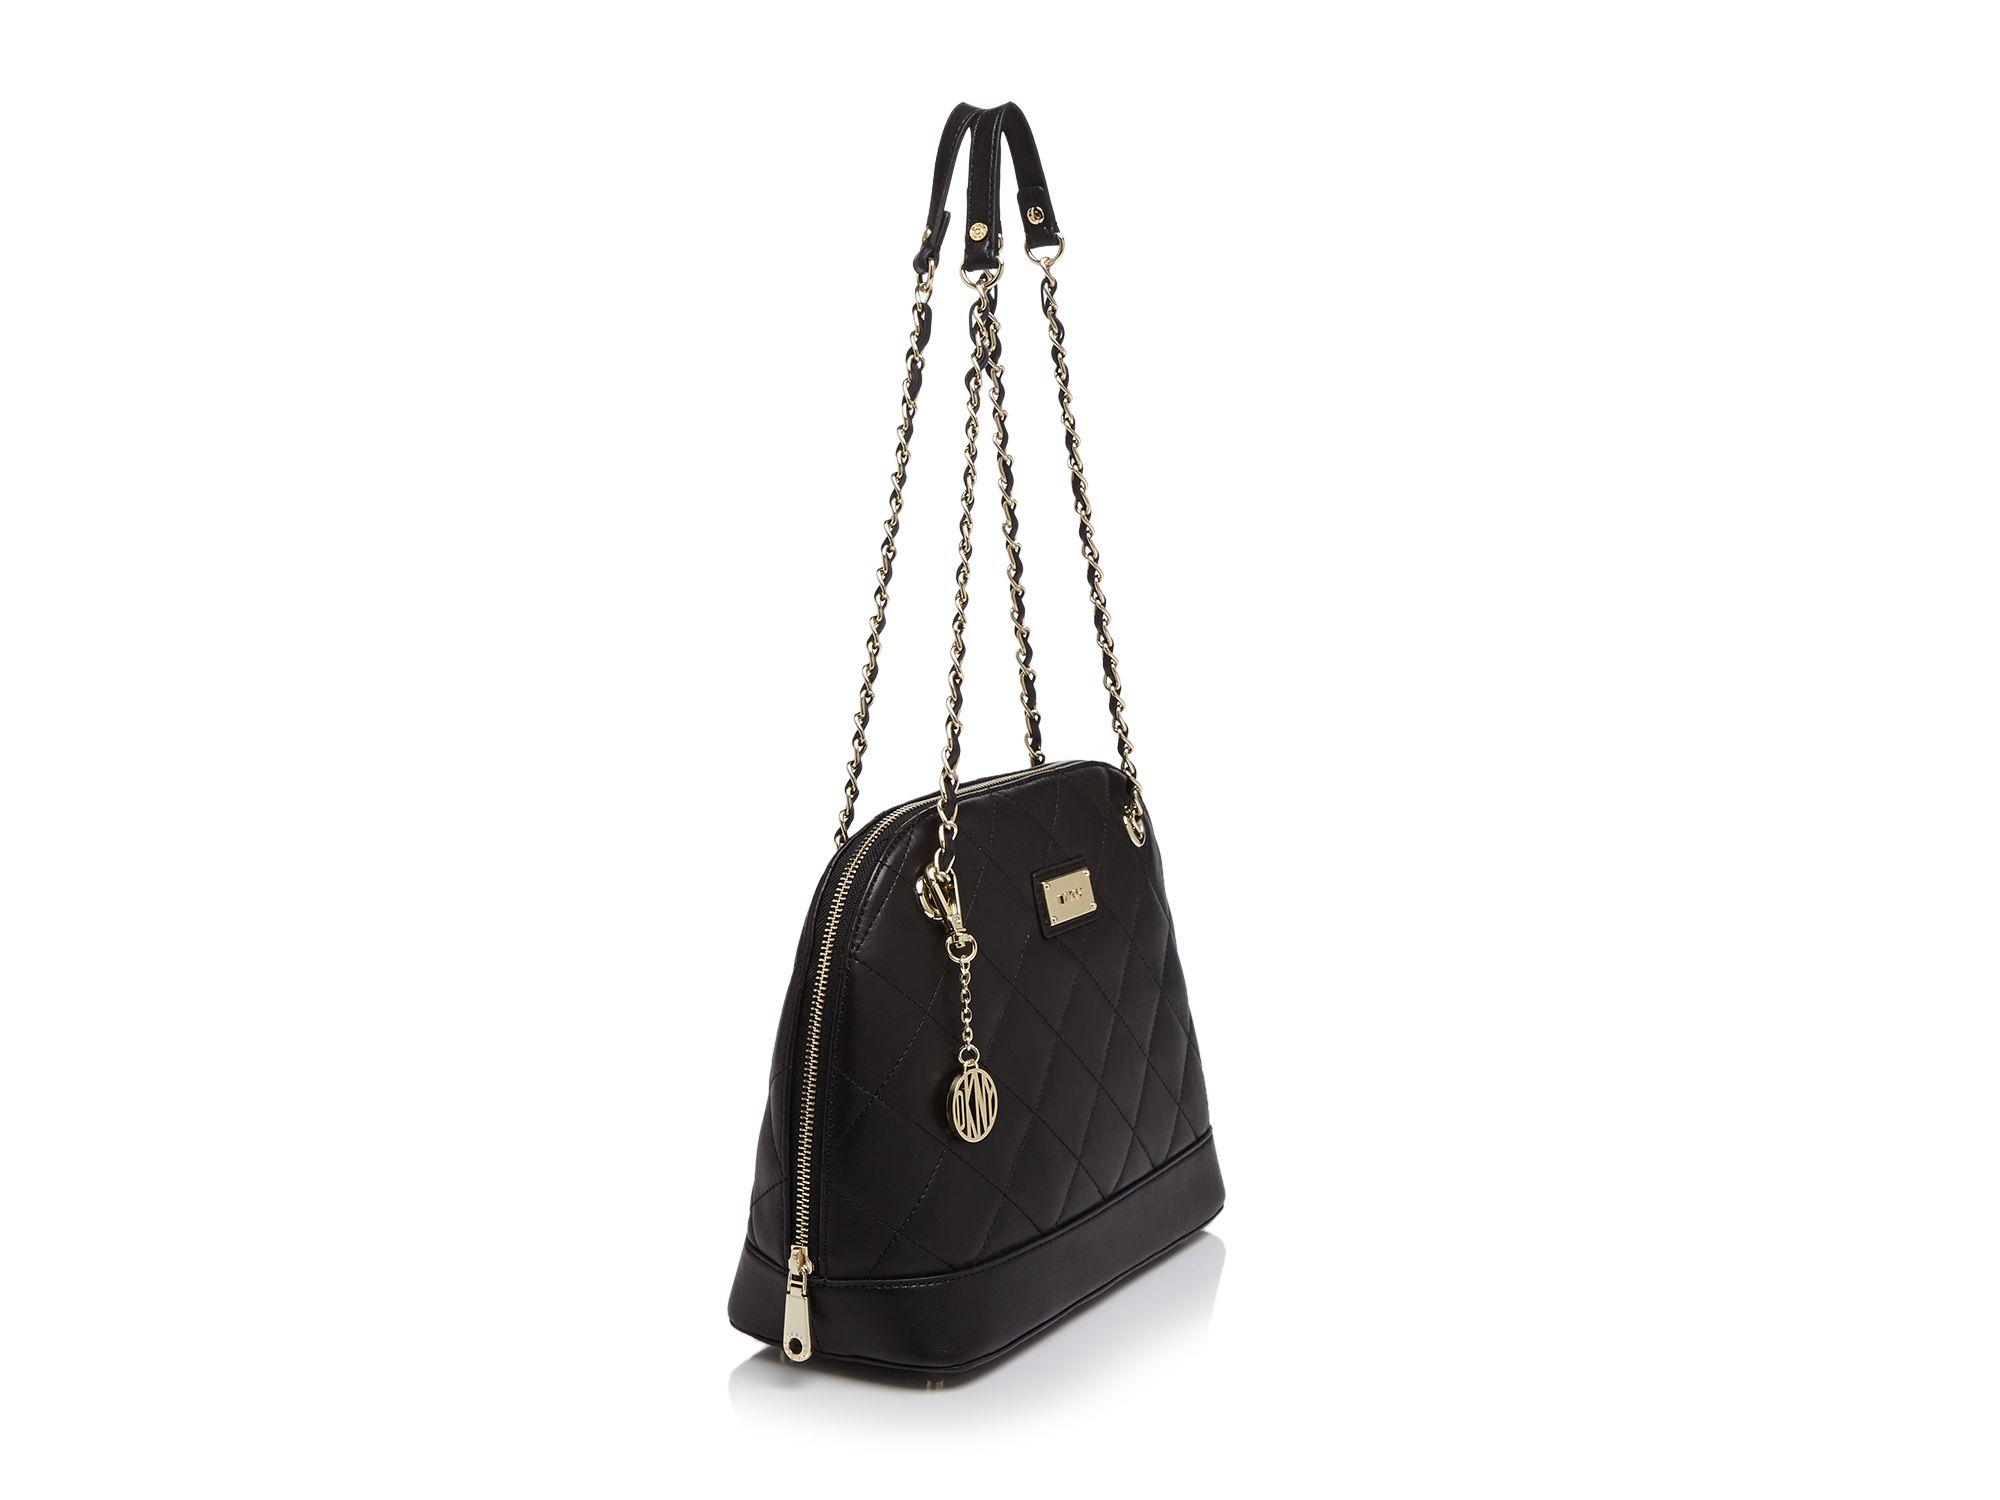 Lyst - Dkny Shoulder Bag - Quilted Nappa Medium Round in Pink : dkny quilted shoulder bag - Adamdwight.com